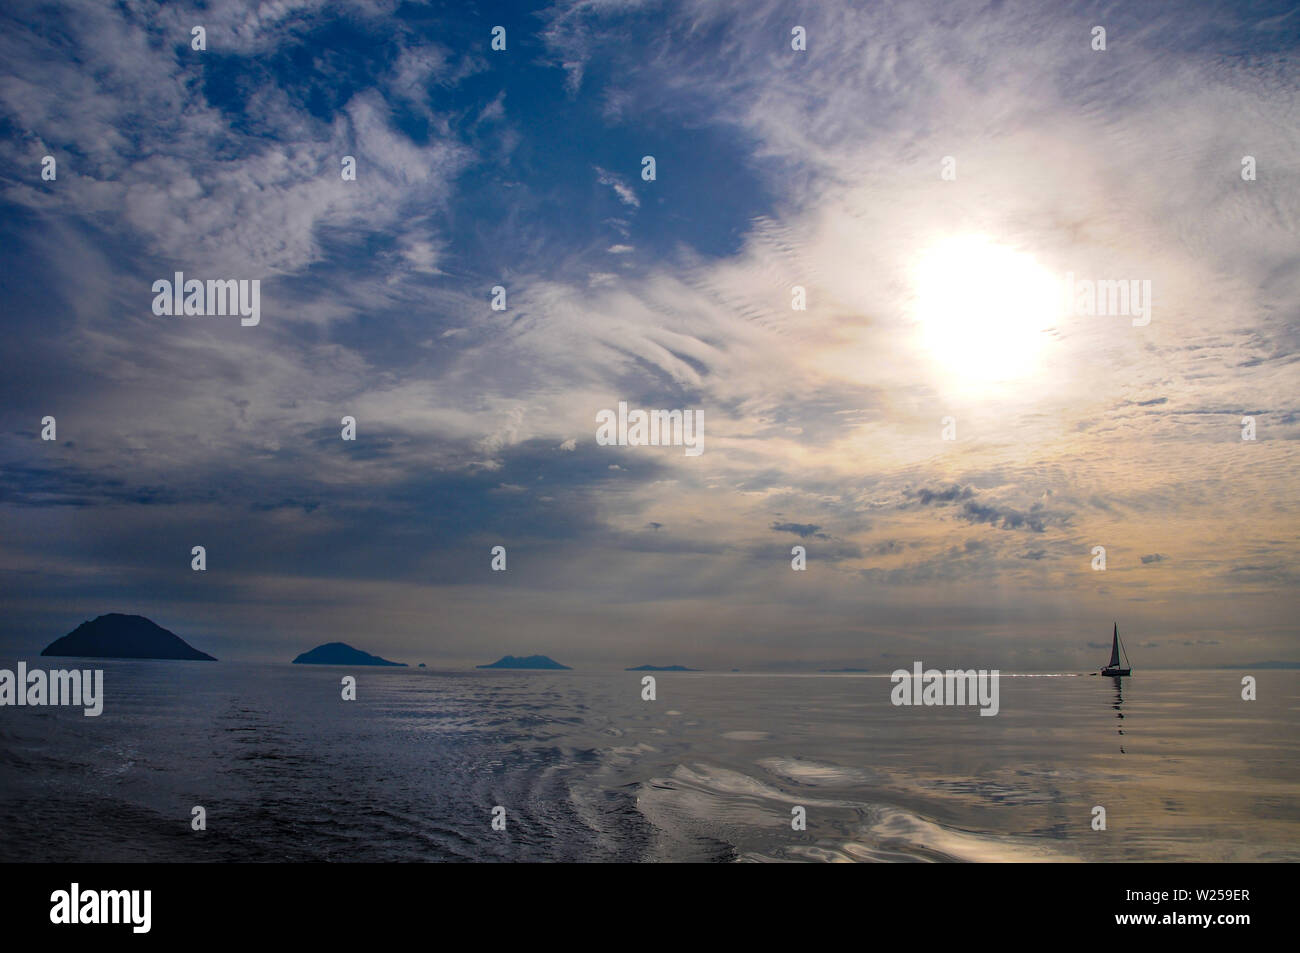 Yacht sailing by the Aeolian Islands, volcanic archipelago, Tyrrhenian Sea, Sicily - at sunrise Stock Photo